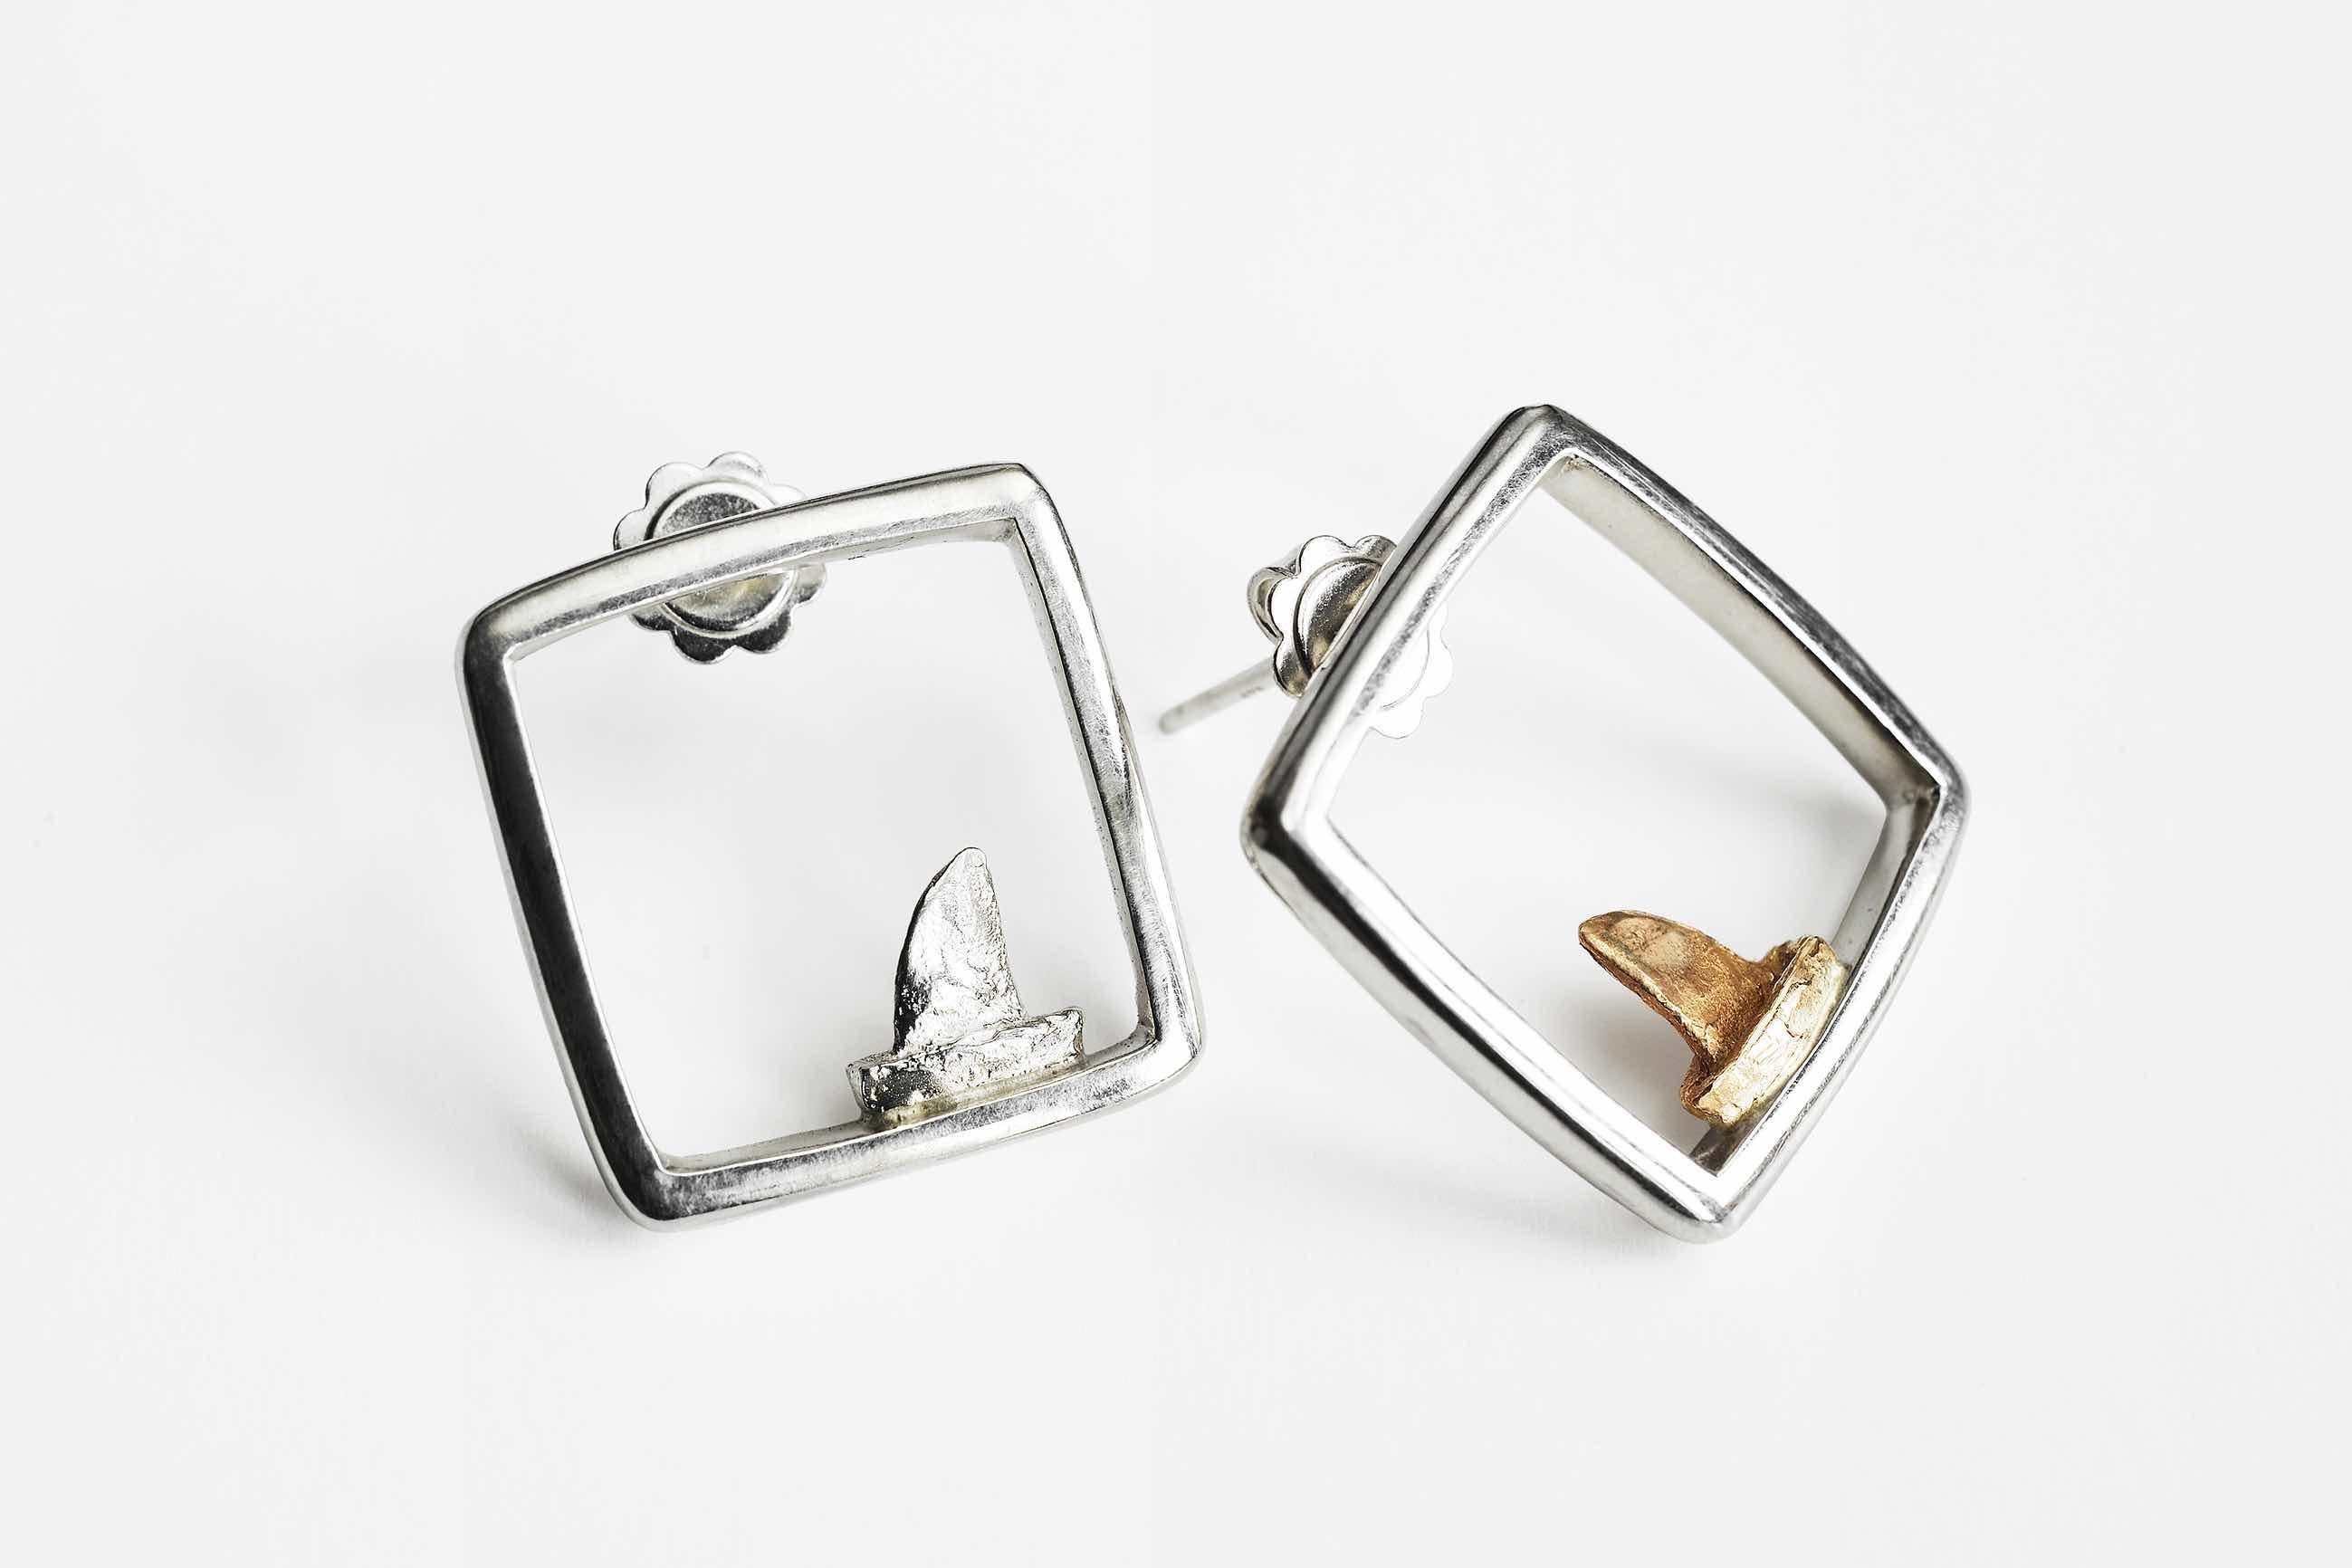 FRANCESCA MO Limited Edition Jewelry Tales_F.MO_Orecchini